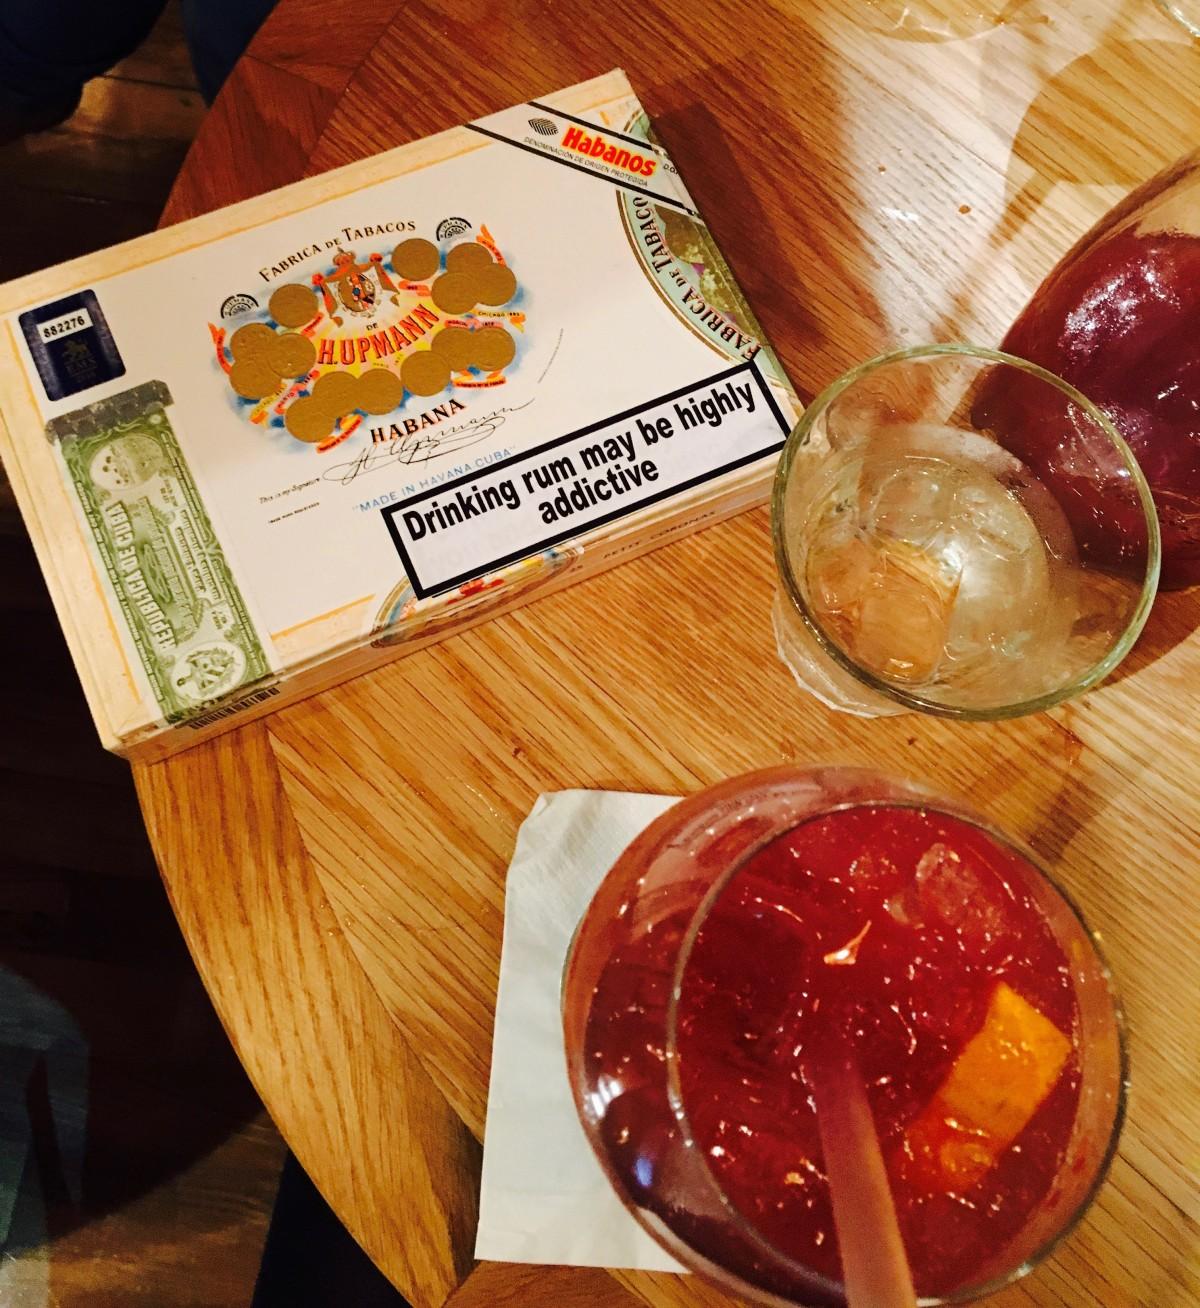 Harrogate Blogger, Harrogate Mama, Harrogate Mama Blog, Revolucion de Cuba Opening, Yorkshire, Blogger, Harrogate, Mama, Blog,IMG_3066.jpg